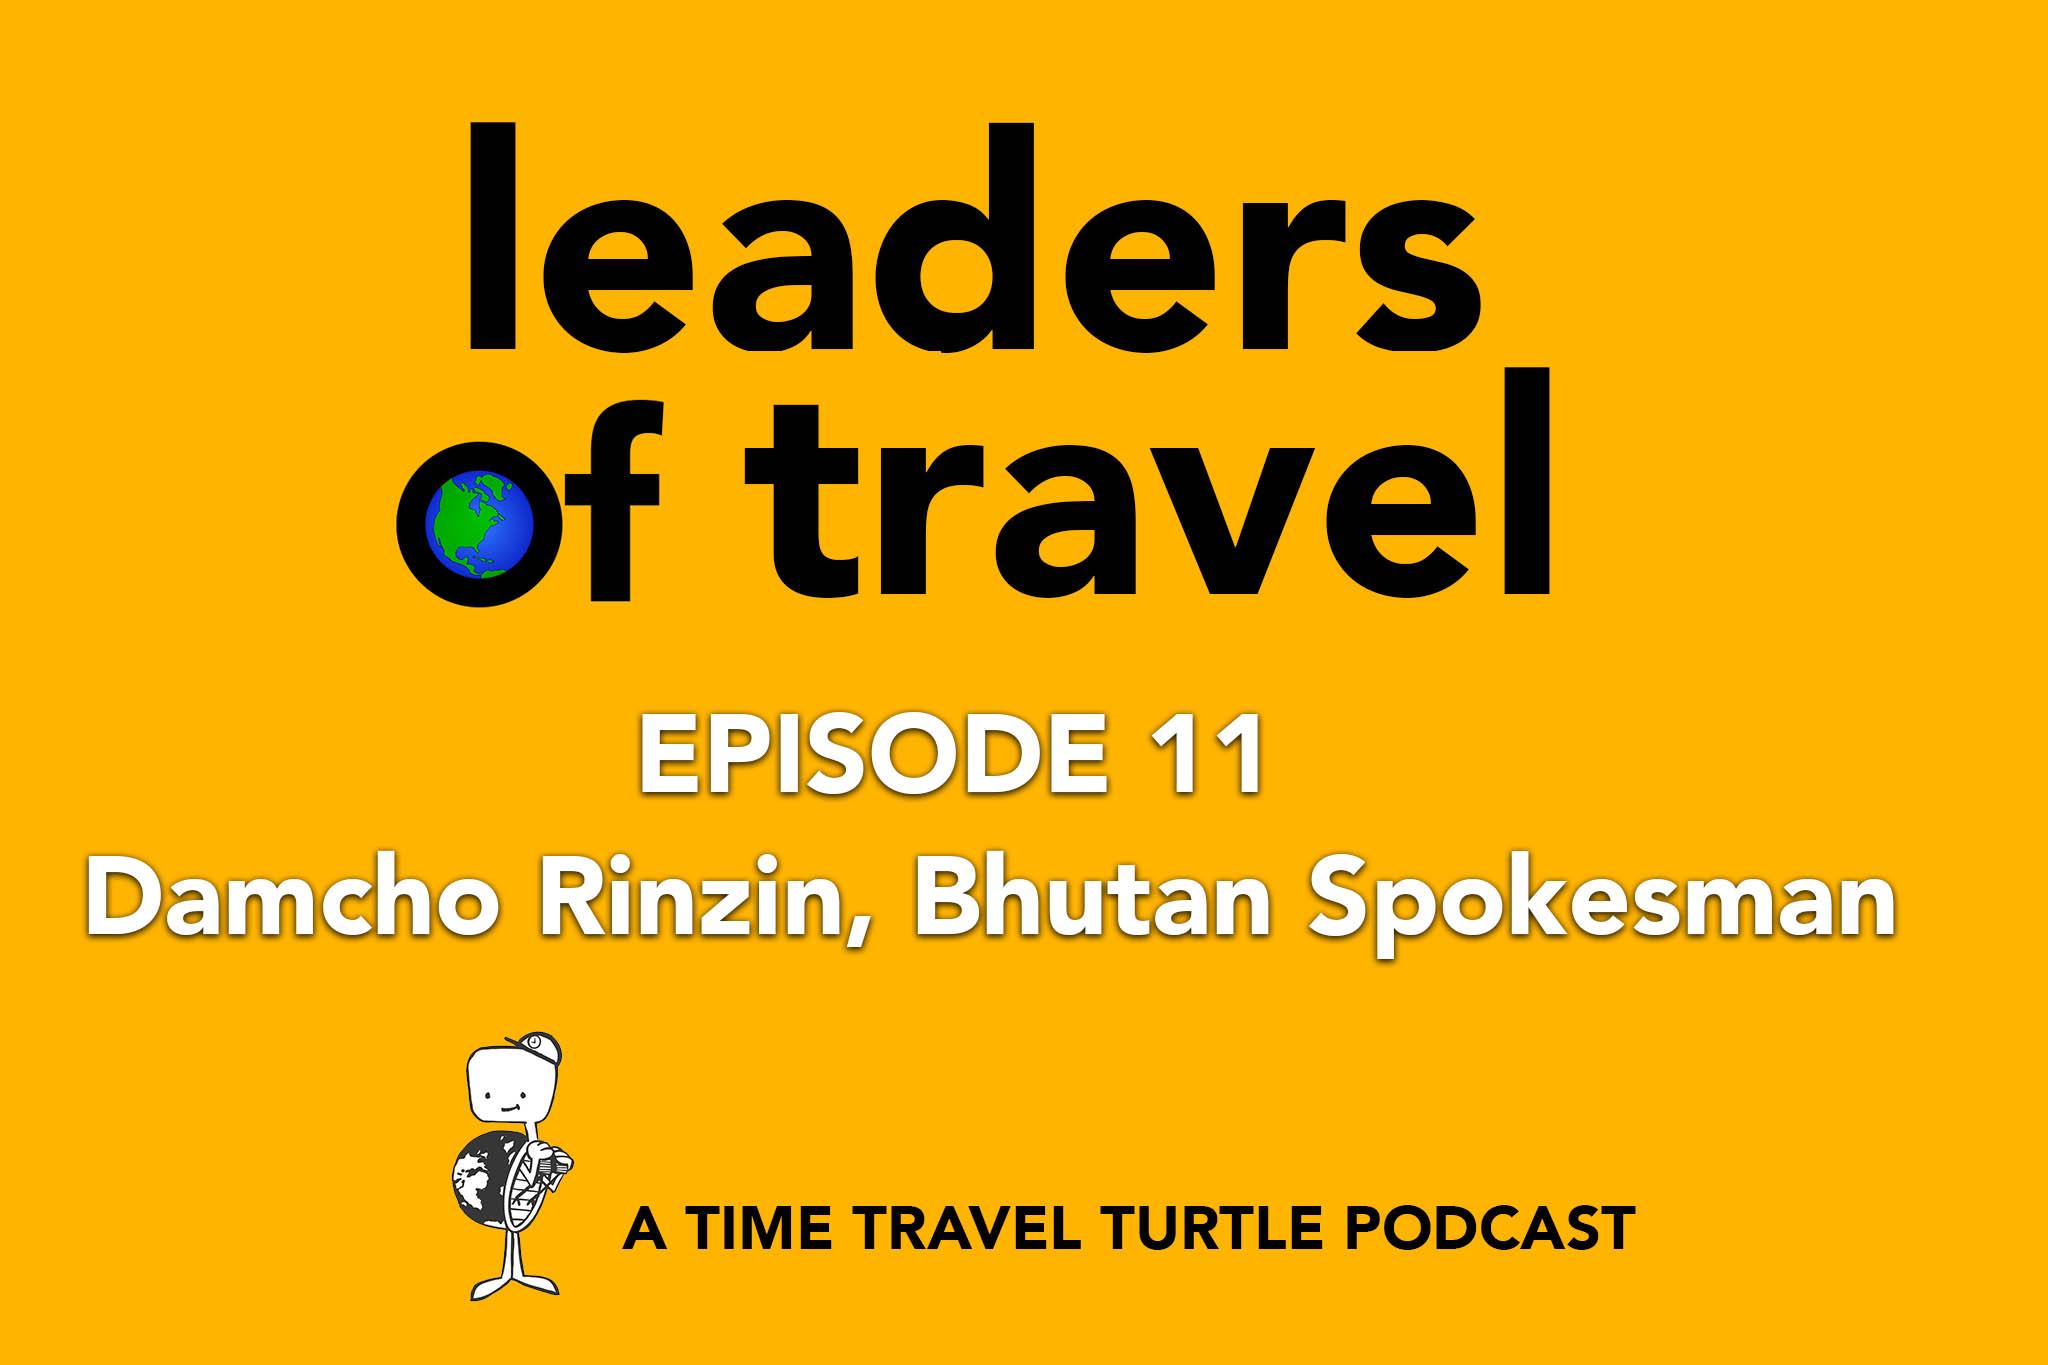 Bhutan's Damcho Rinzin